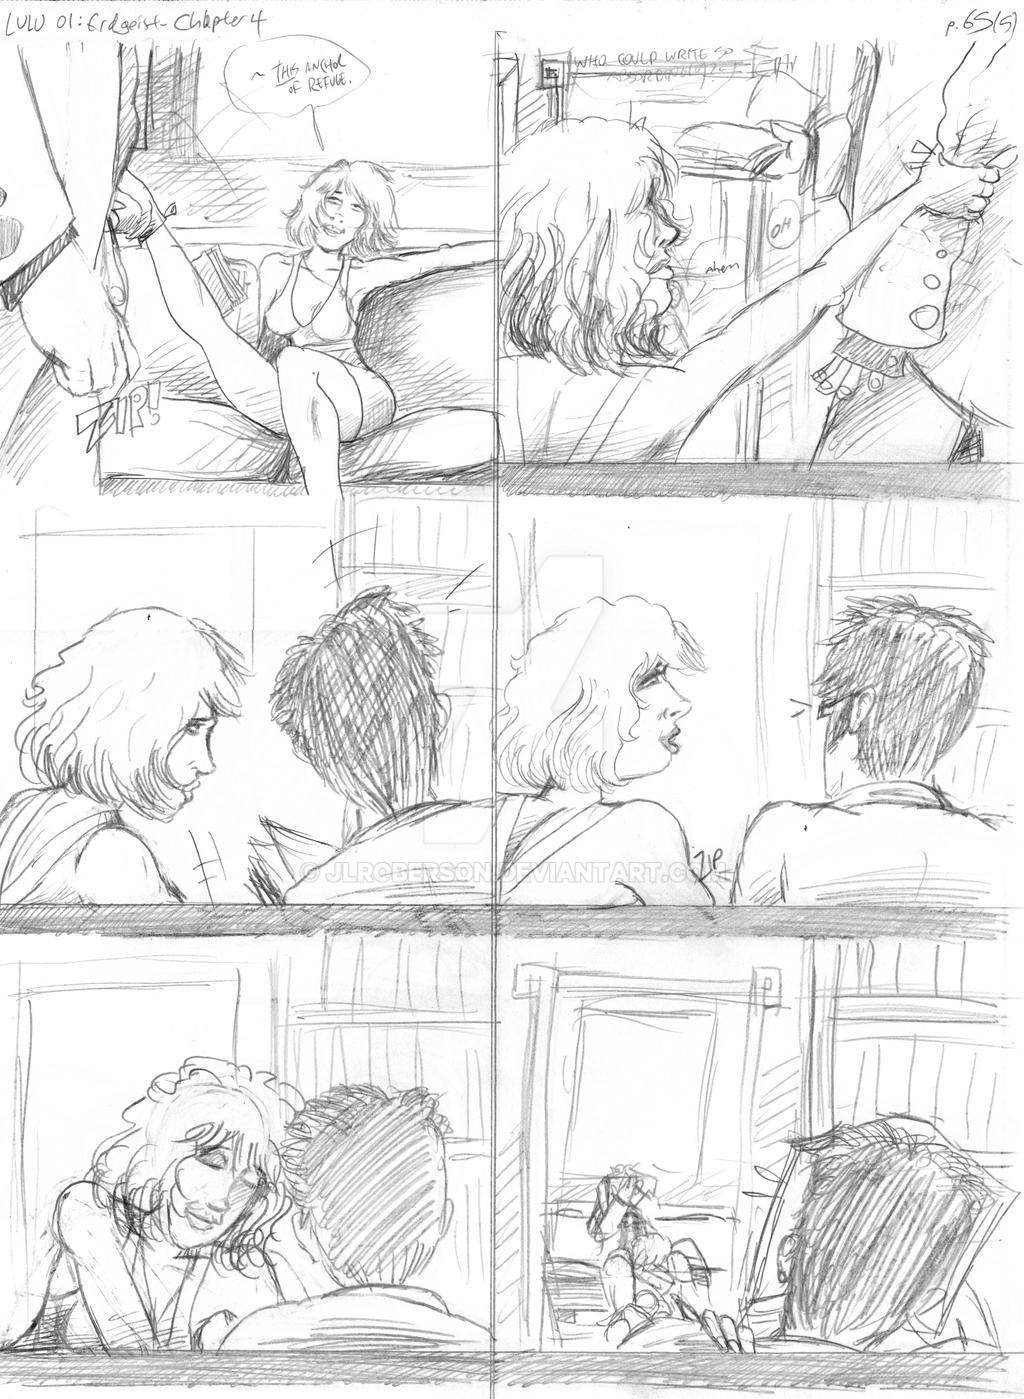 LULU Book 2 - Chapter 4 p. 65 Pencil